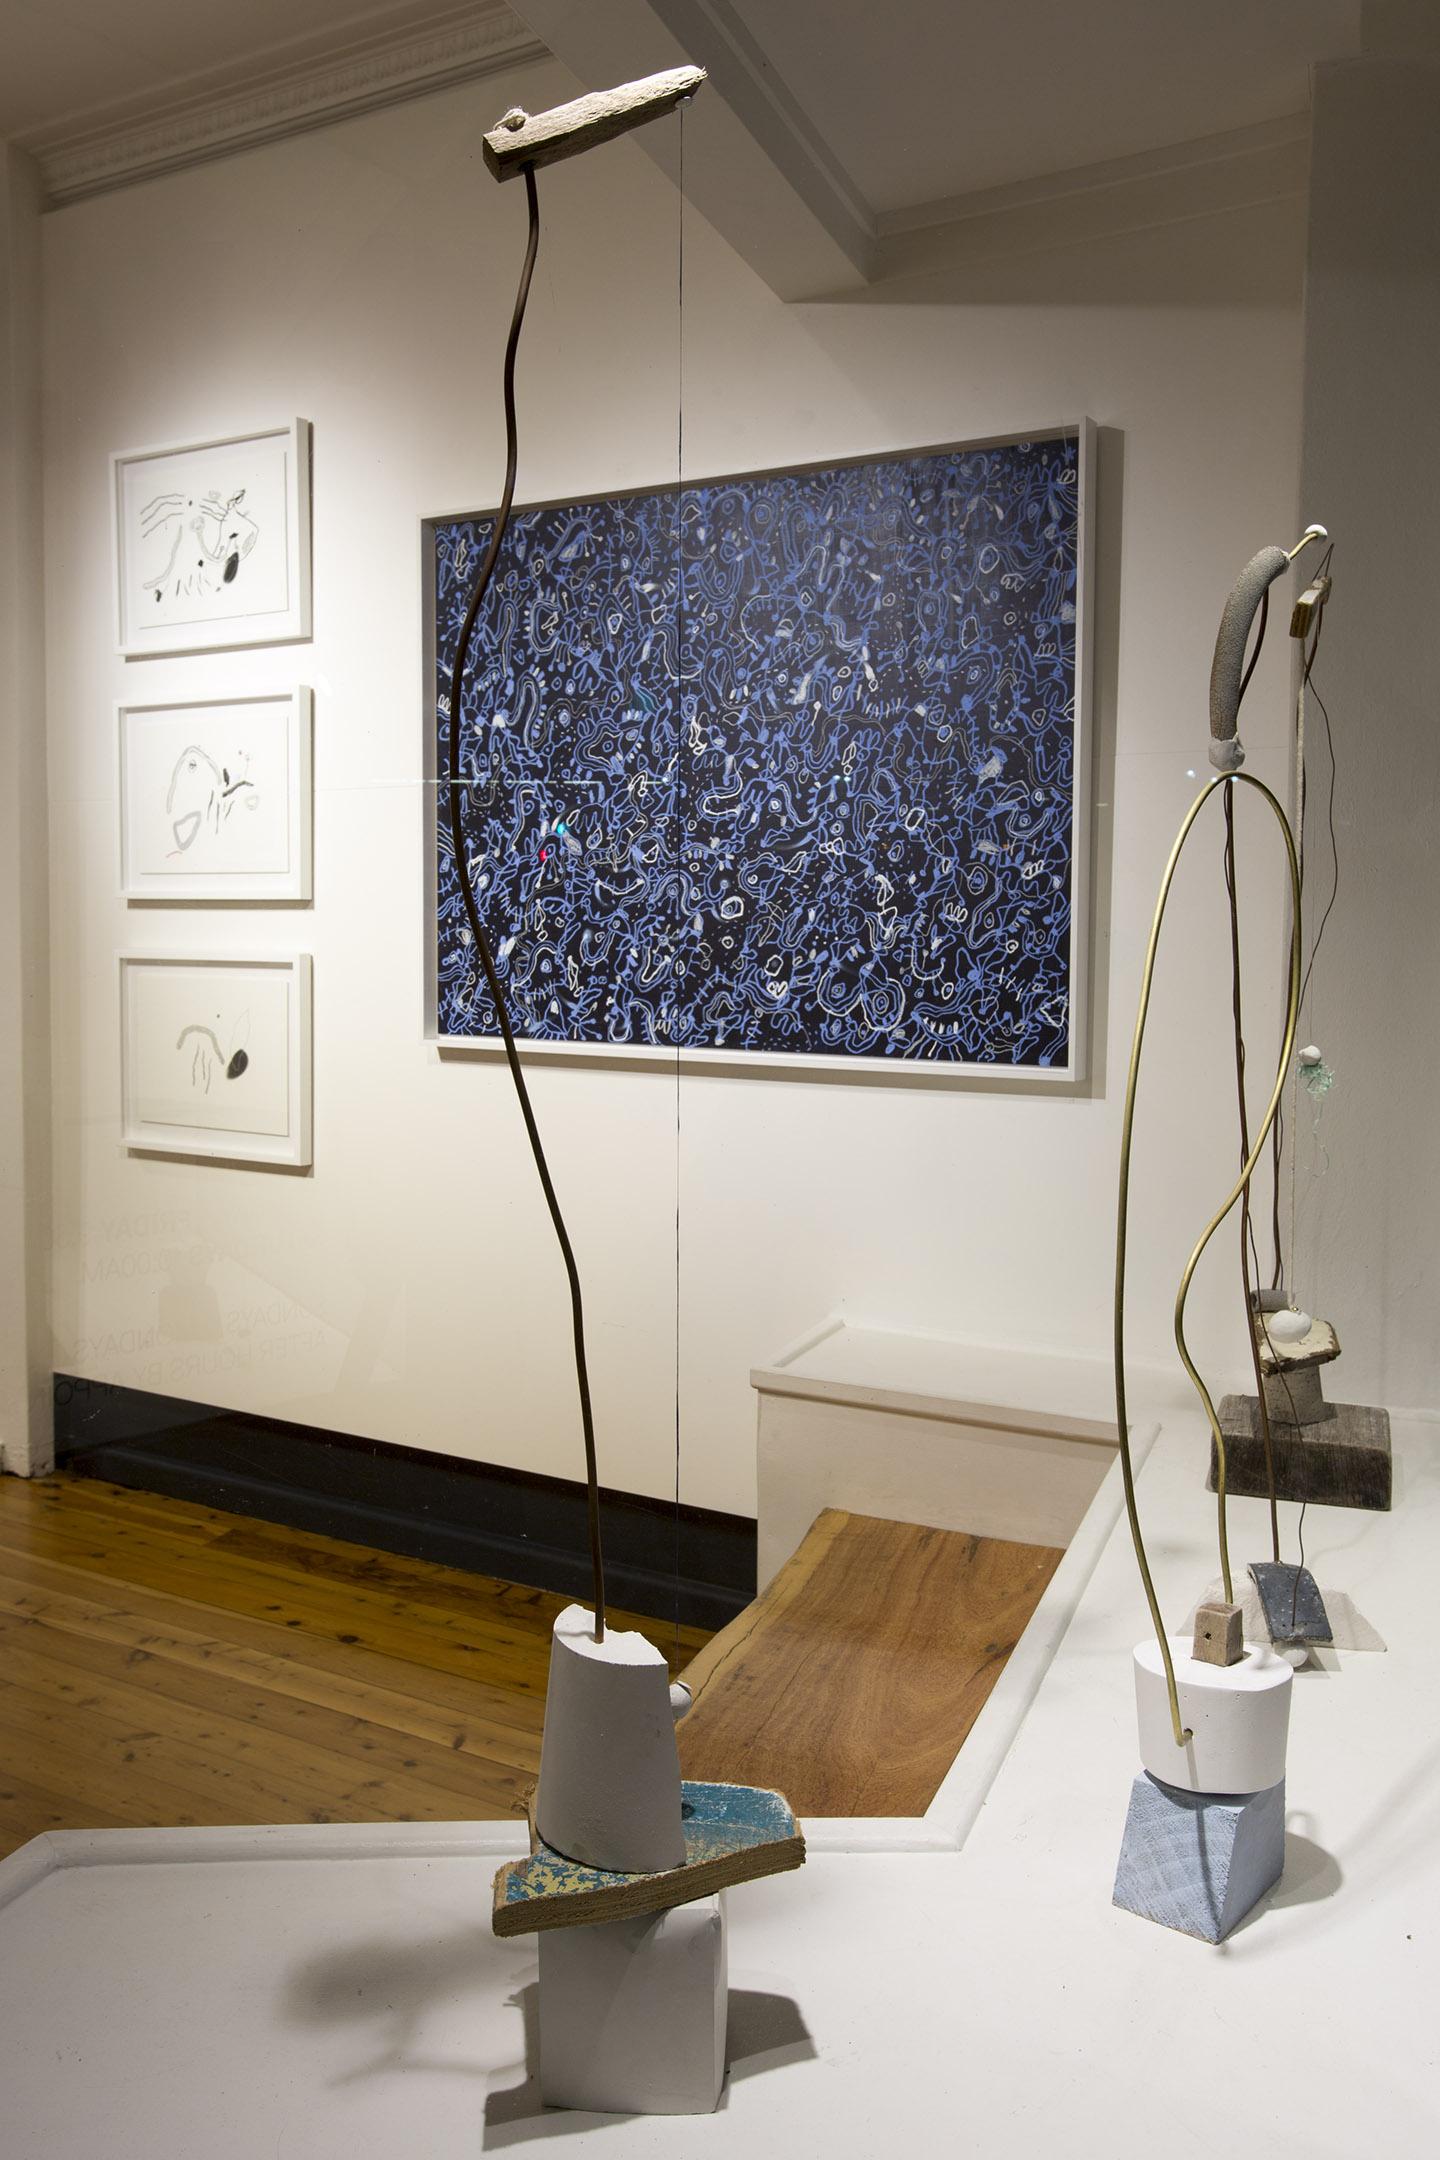 Artworks by Matthew Bromhead